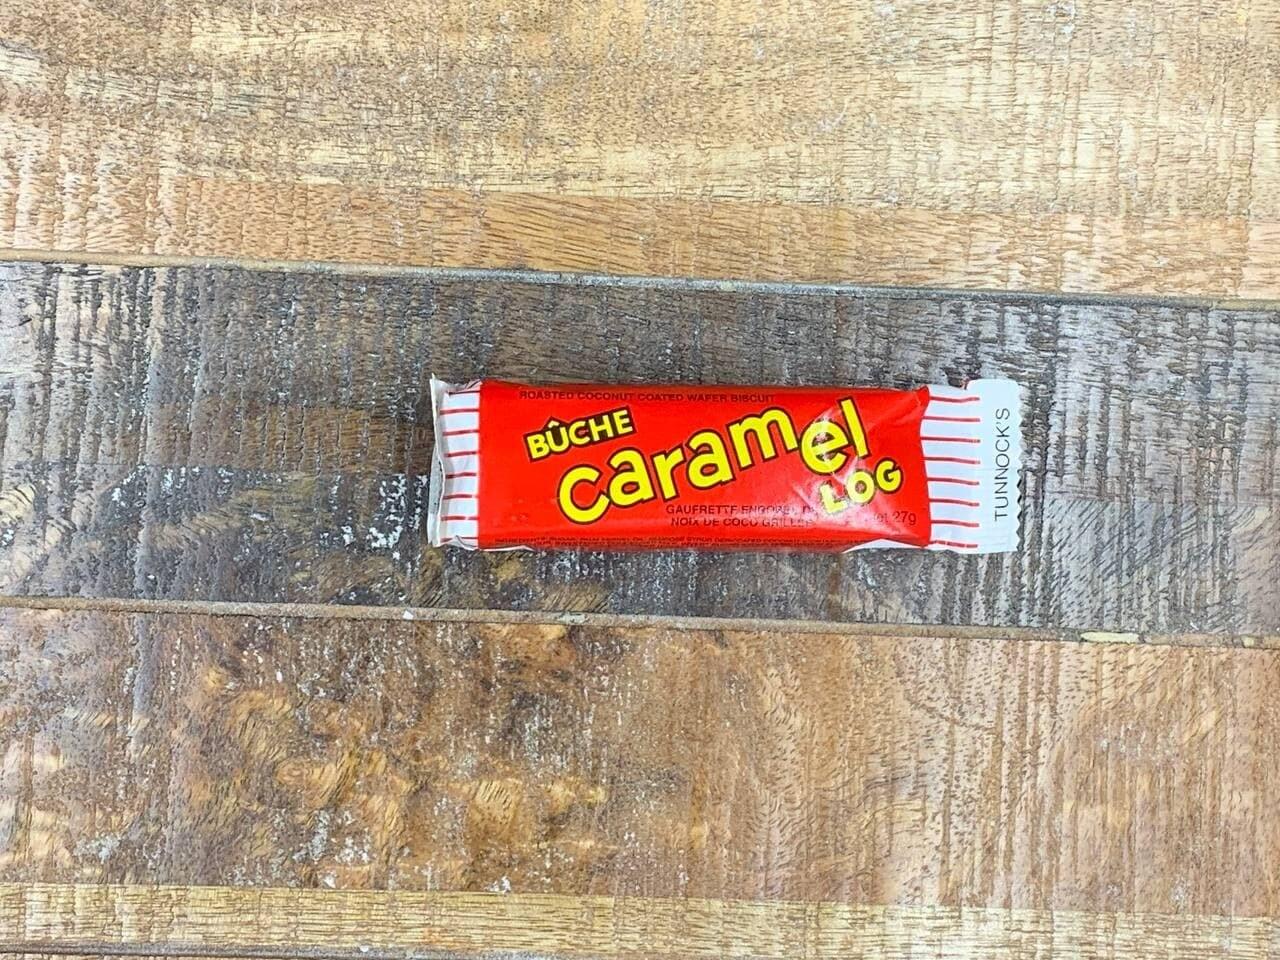 Tunnocks Caramel Logs